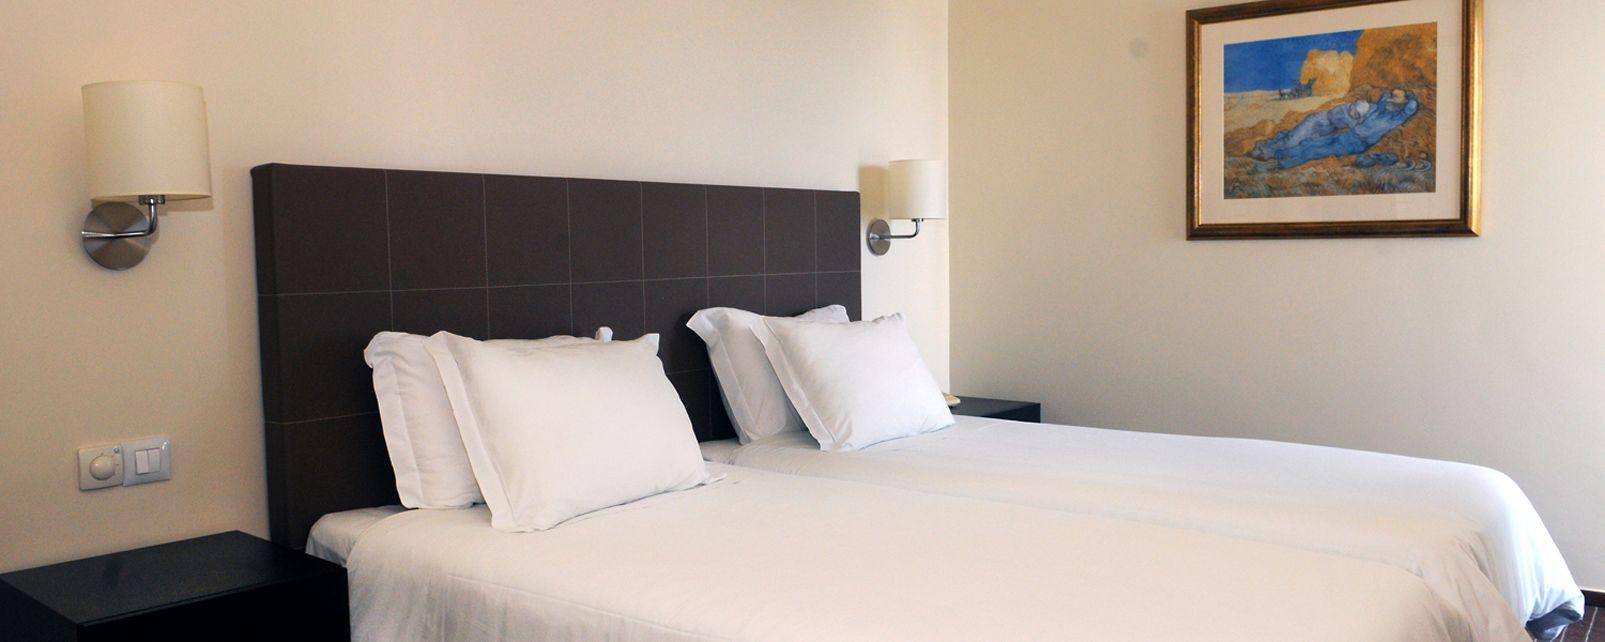 Hotel Girassol Funchal Bewertung